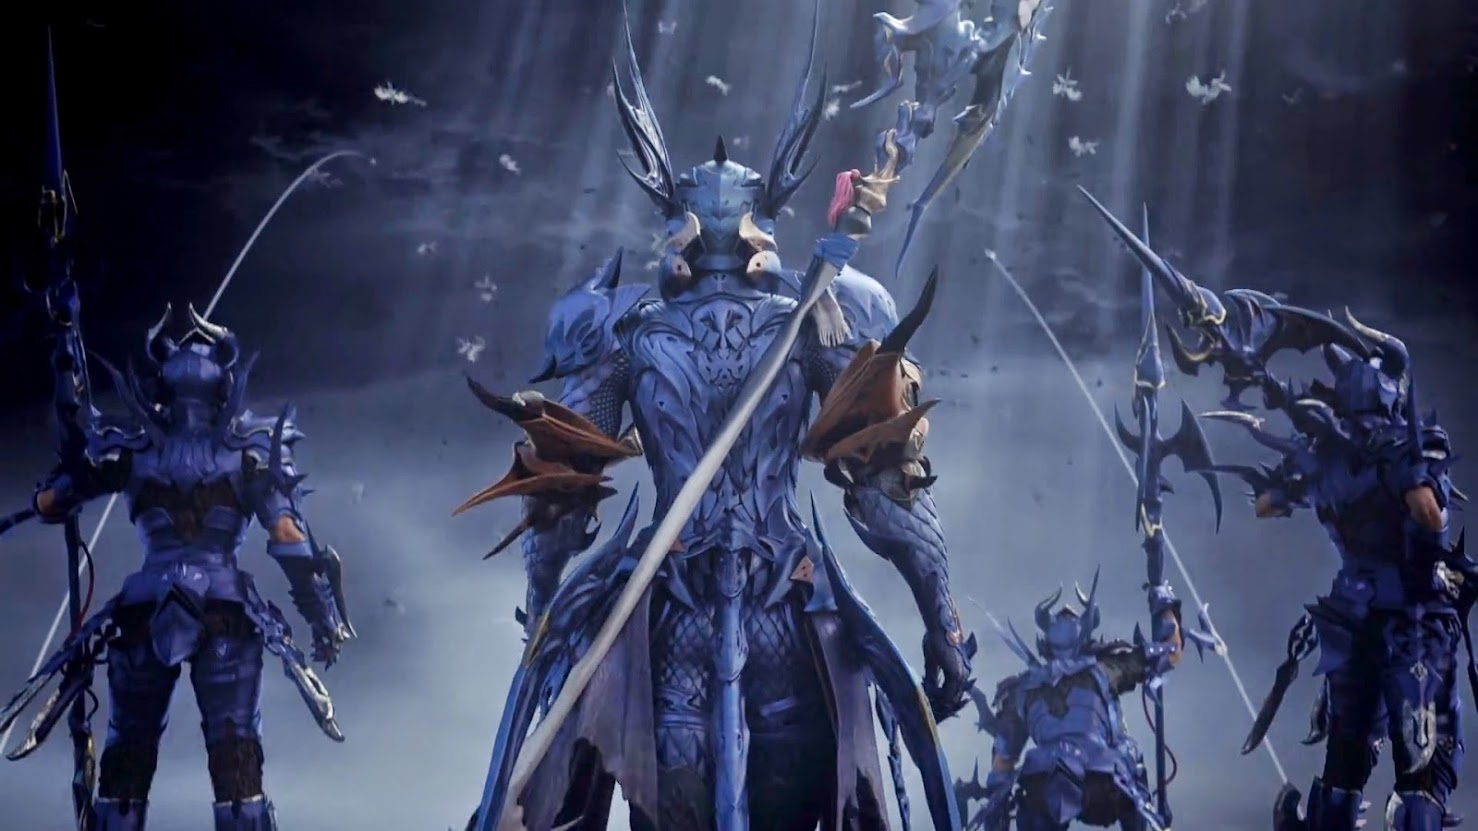 Square Enix Completes Final Fantasy XIV's Developer Diary